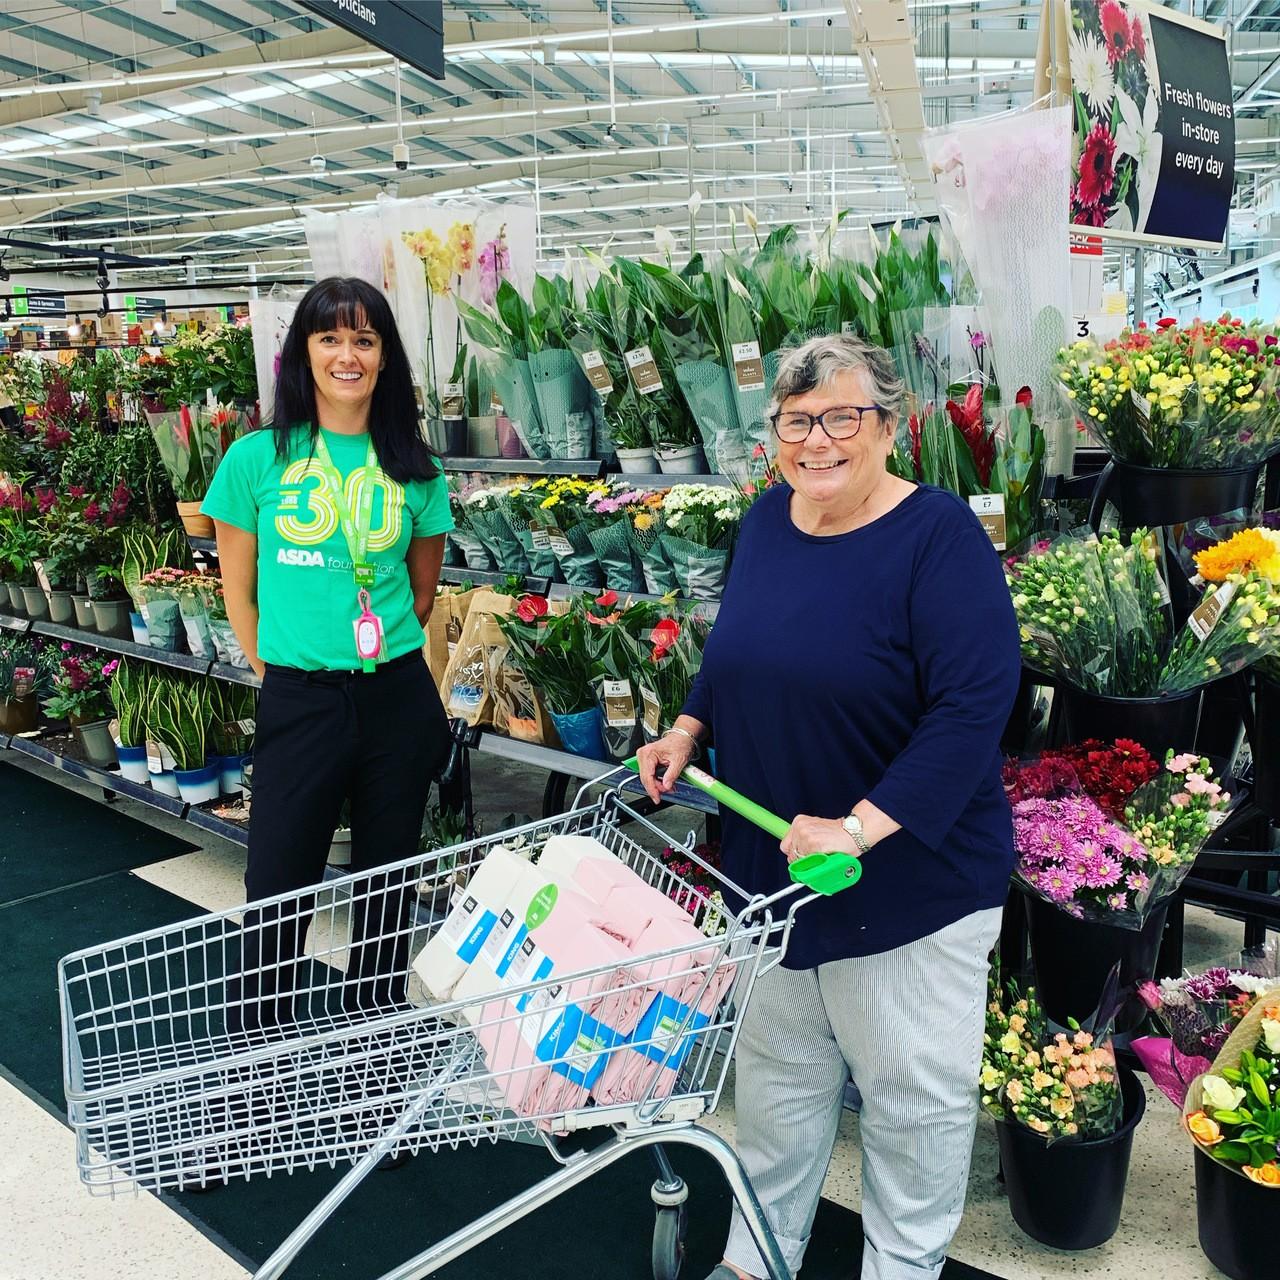 Donation to Scrubstars | Asda Havant